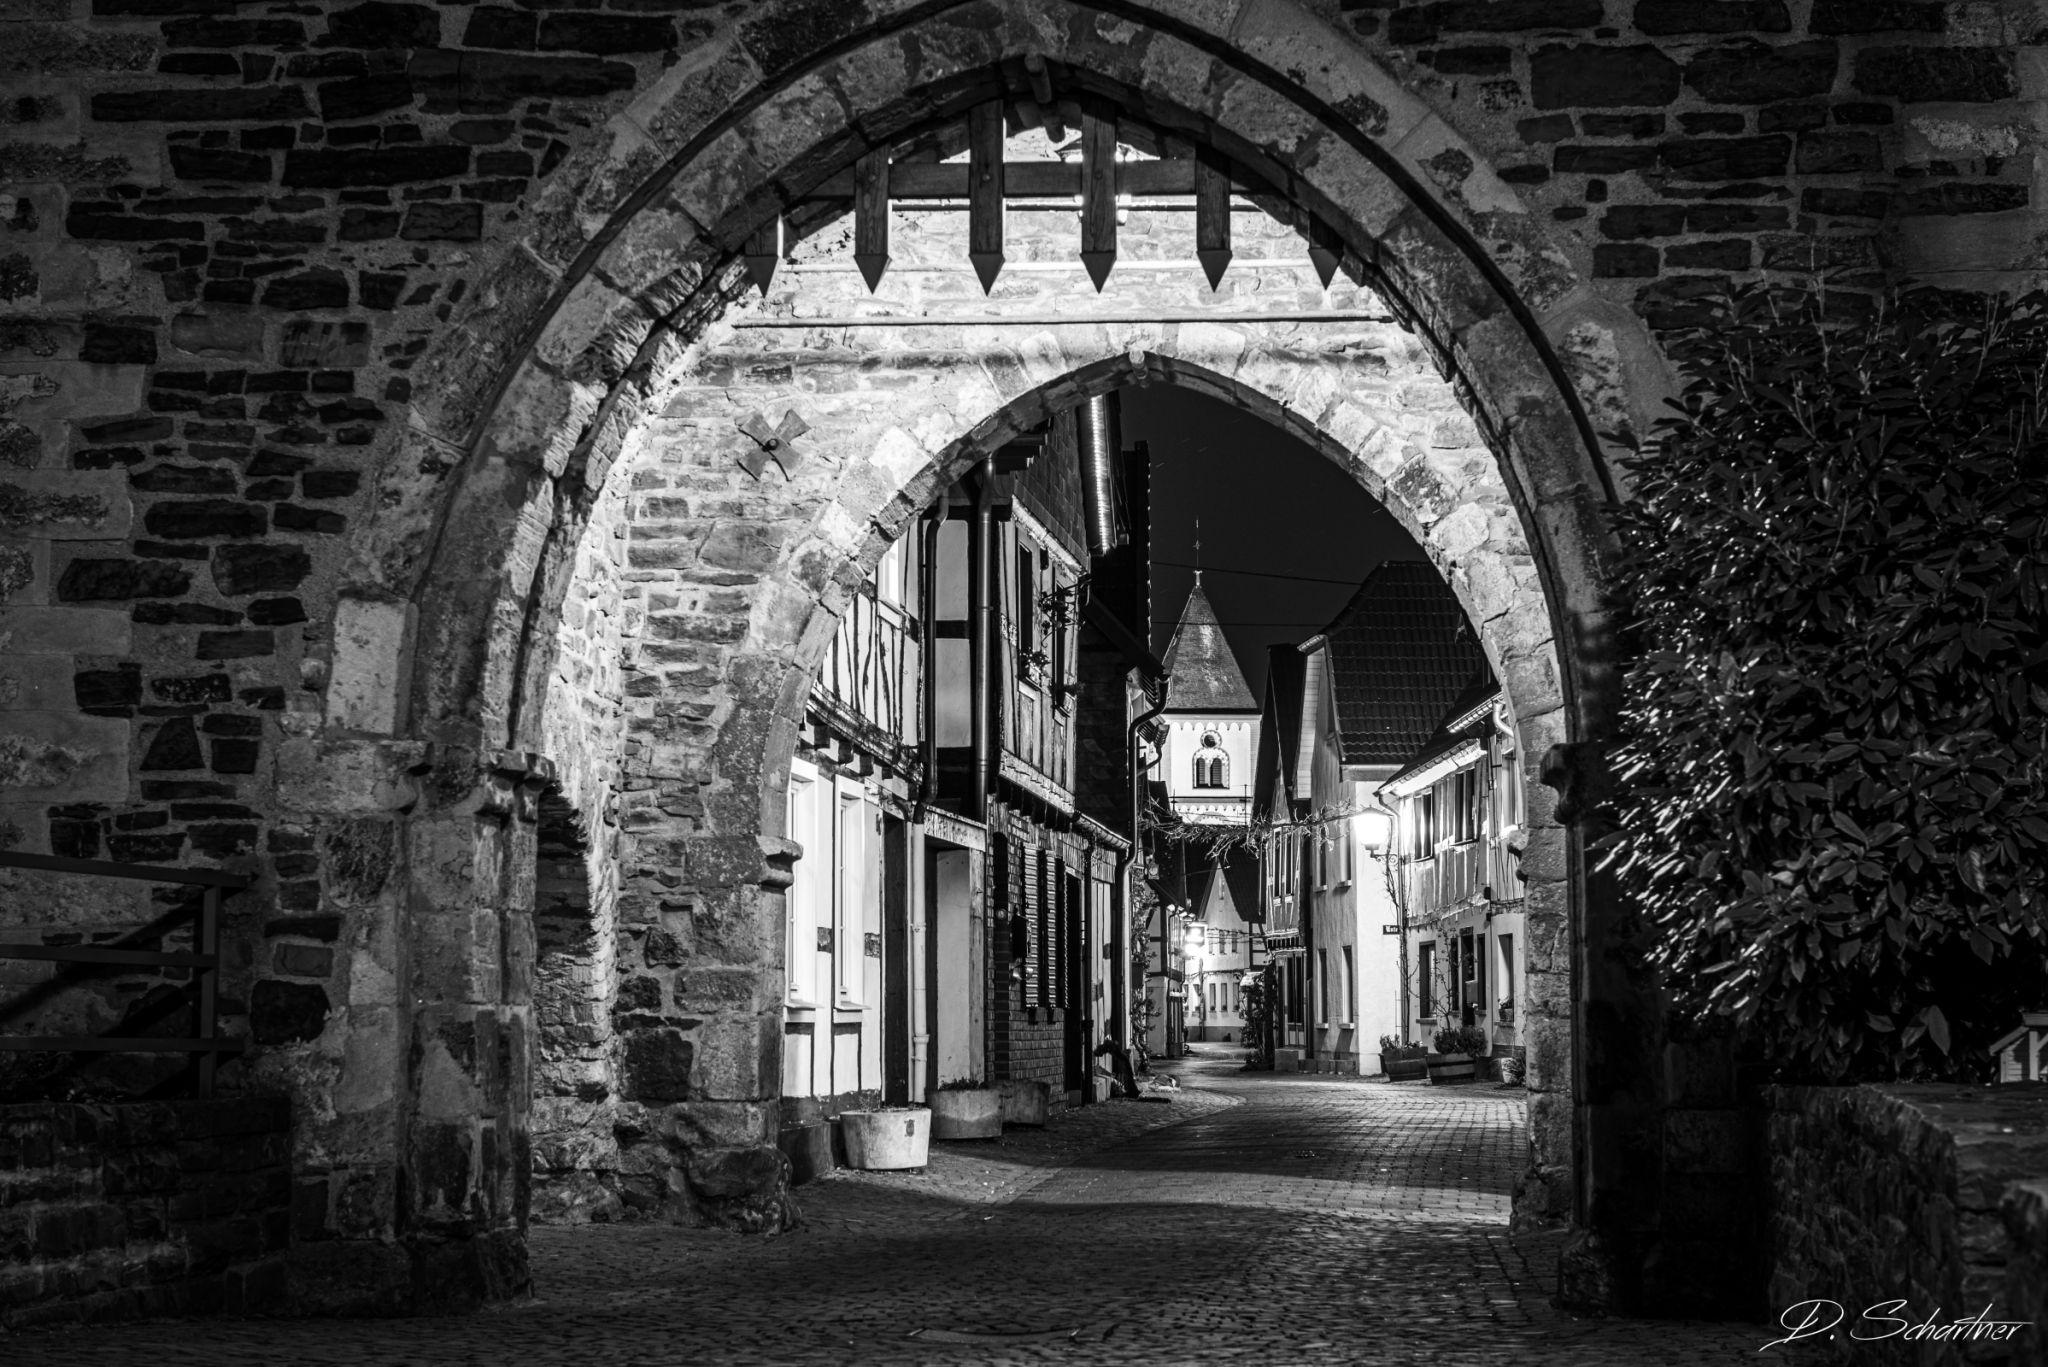 Stadttor Erpel, Germany